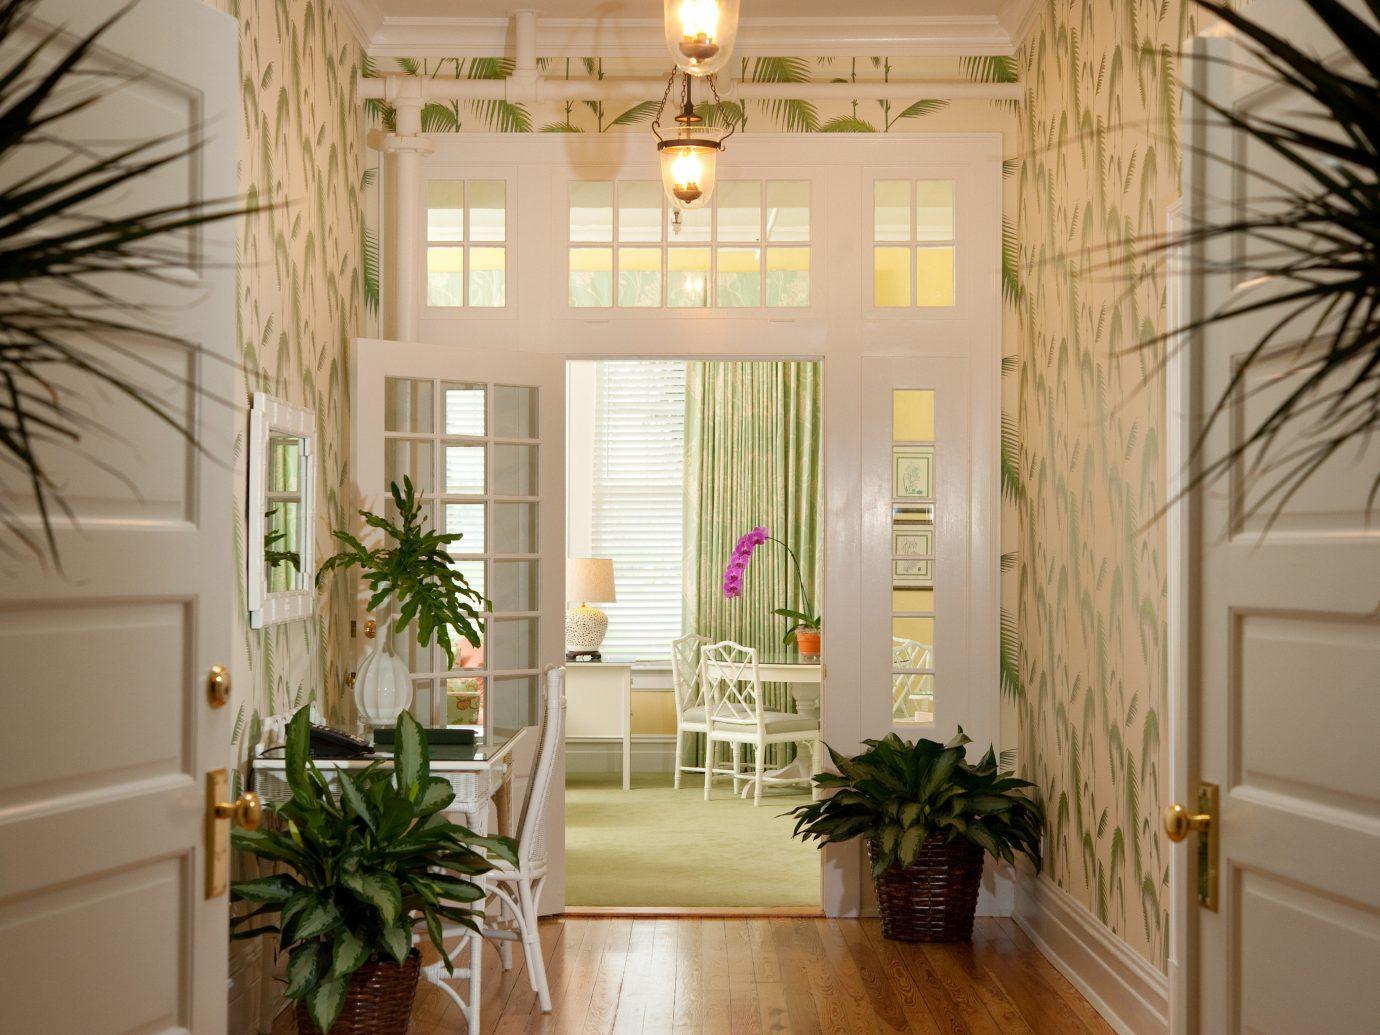 french doors hallway Lounge Trip Ideas plant indoor room home window palm living room house estate interior design hall lighting Lobby Design condominium apartment decorated furniture